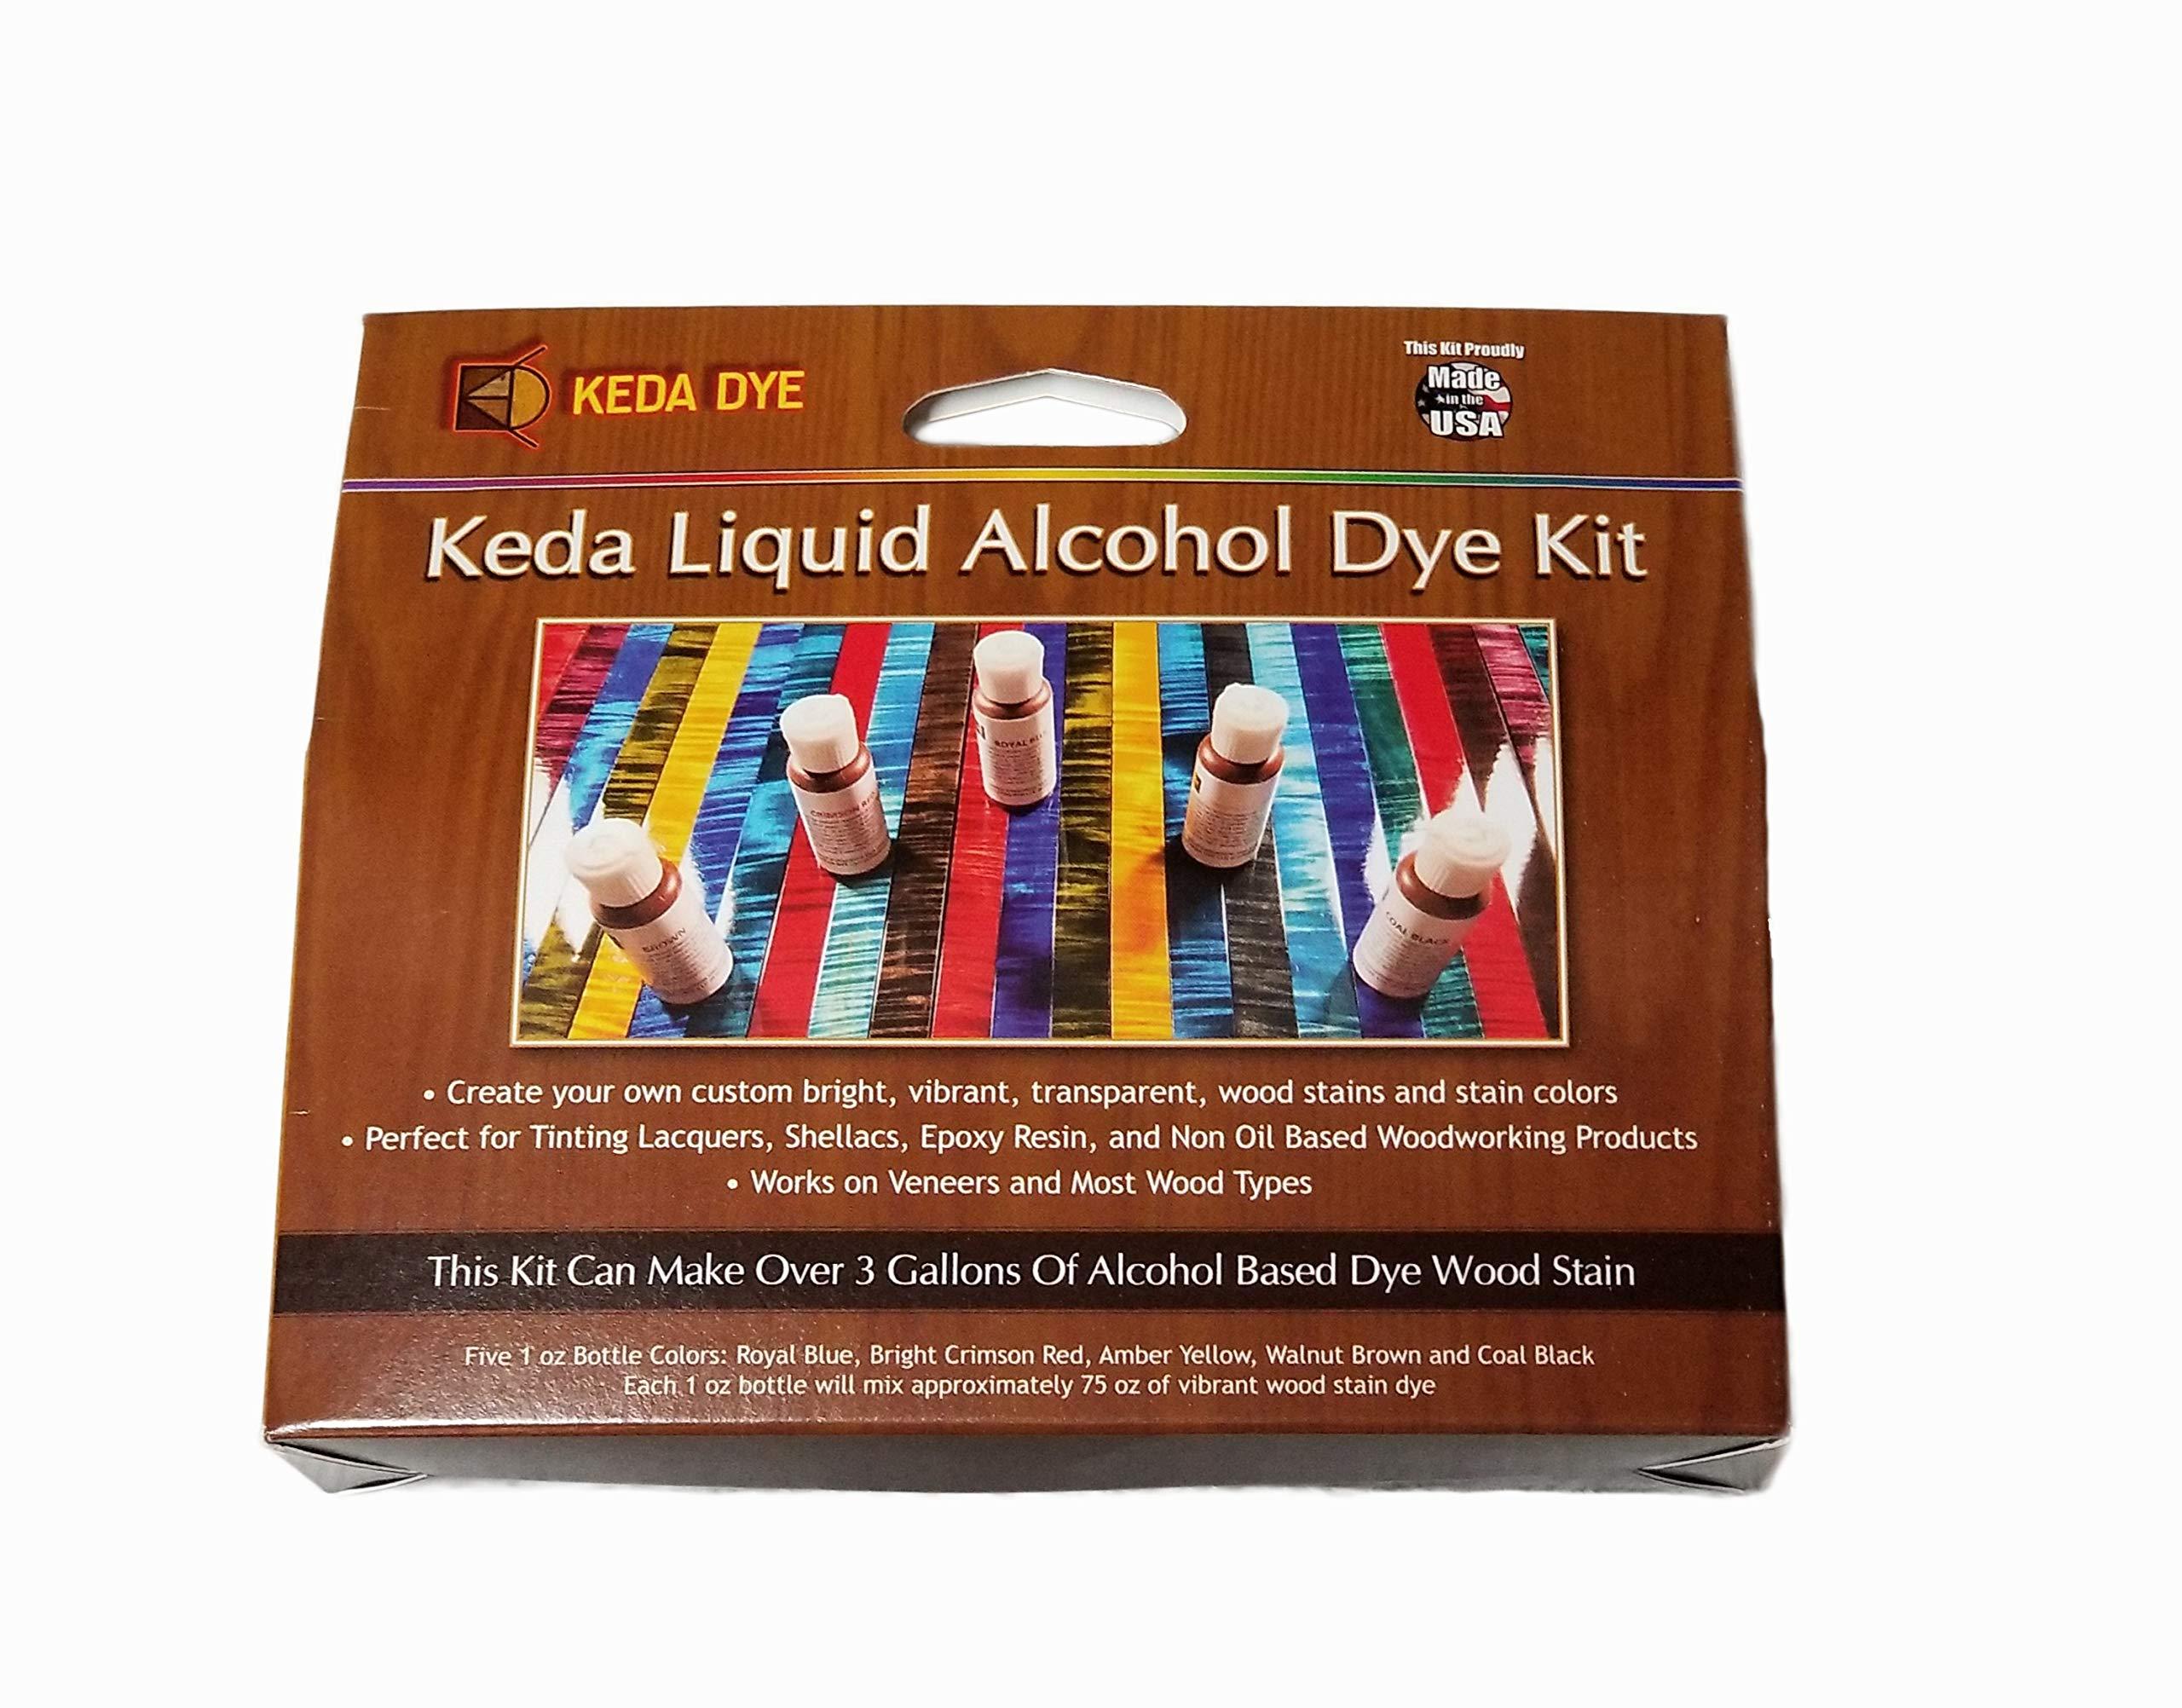 Vibrant Wood Dye Liquid Offered In 5 Color Liquid Dye Kit - Solvent Alcohol Dye by Keda Dye